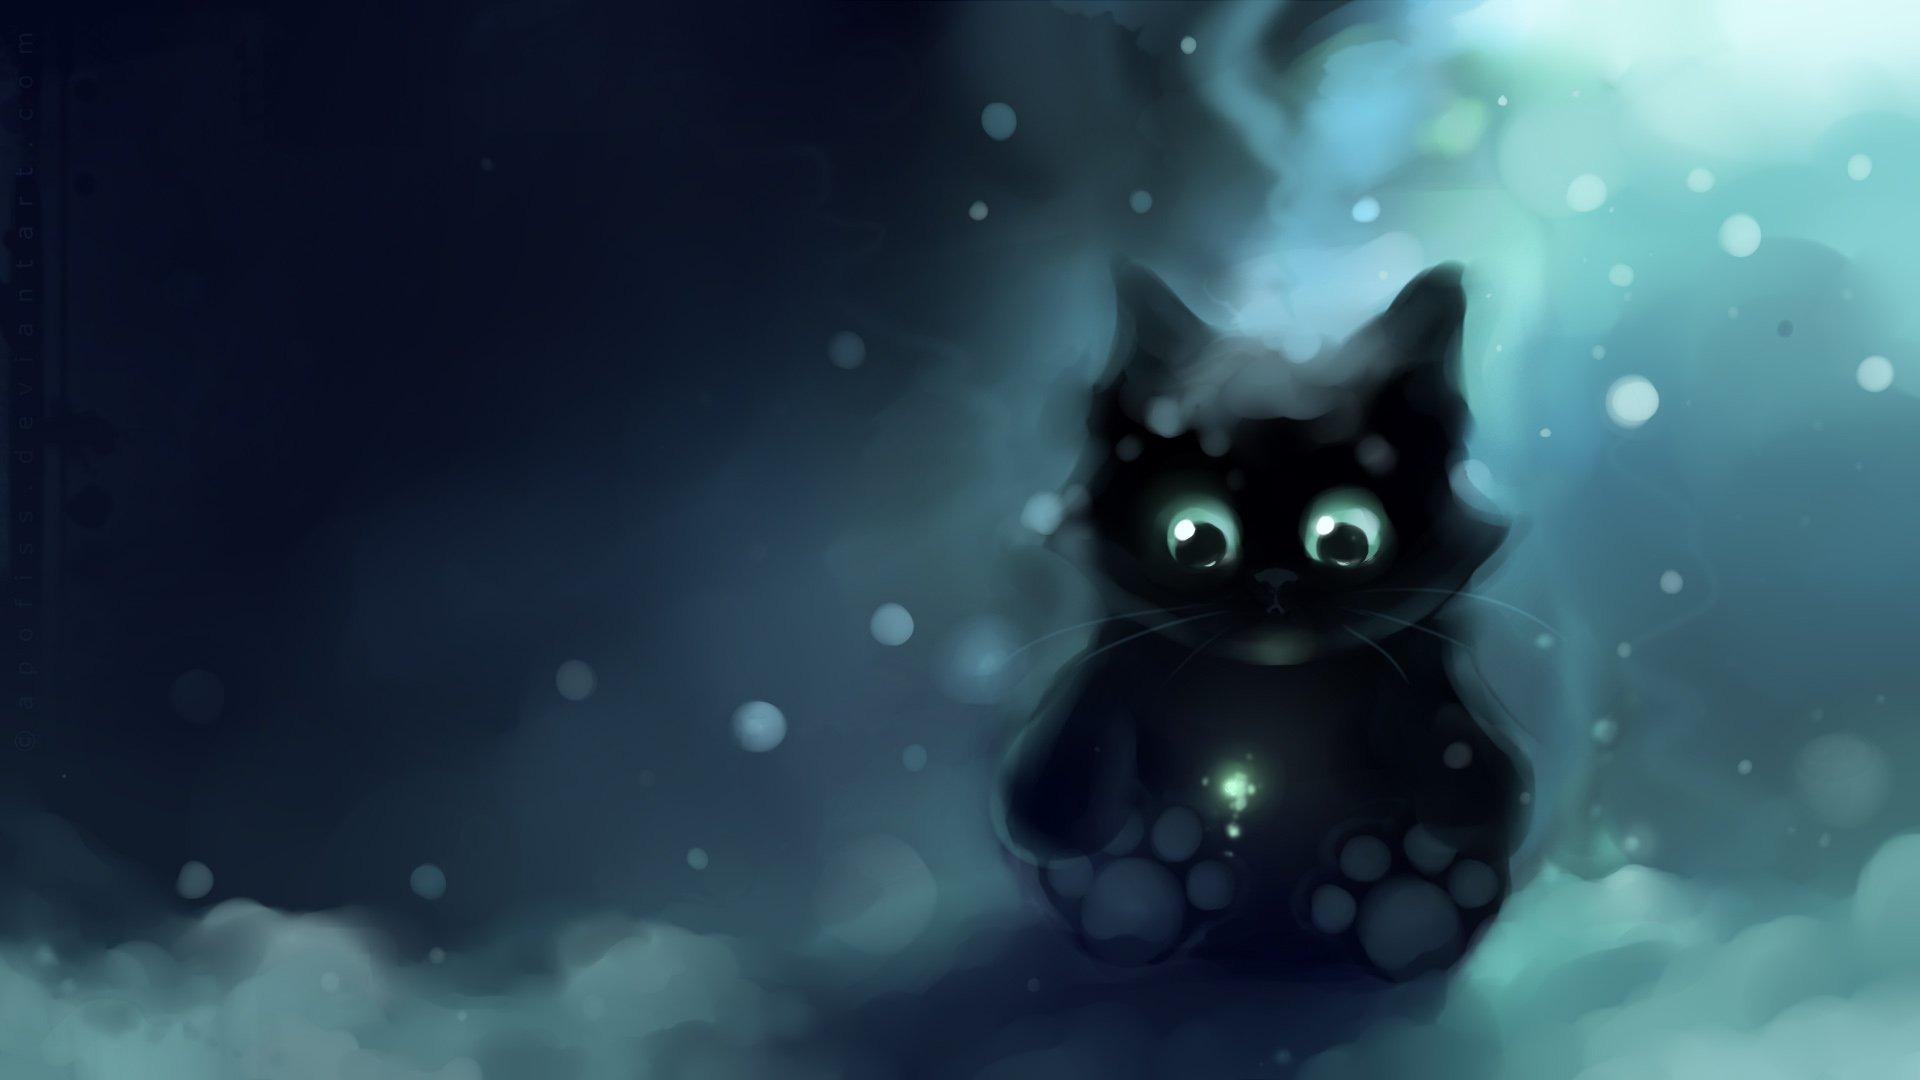 10 Best Hd Cute Cat Wallpapers Full Hd 1080p For Pc: Apofiss水彩插画 小黑猫壁纸18